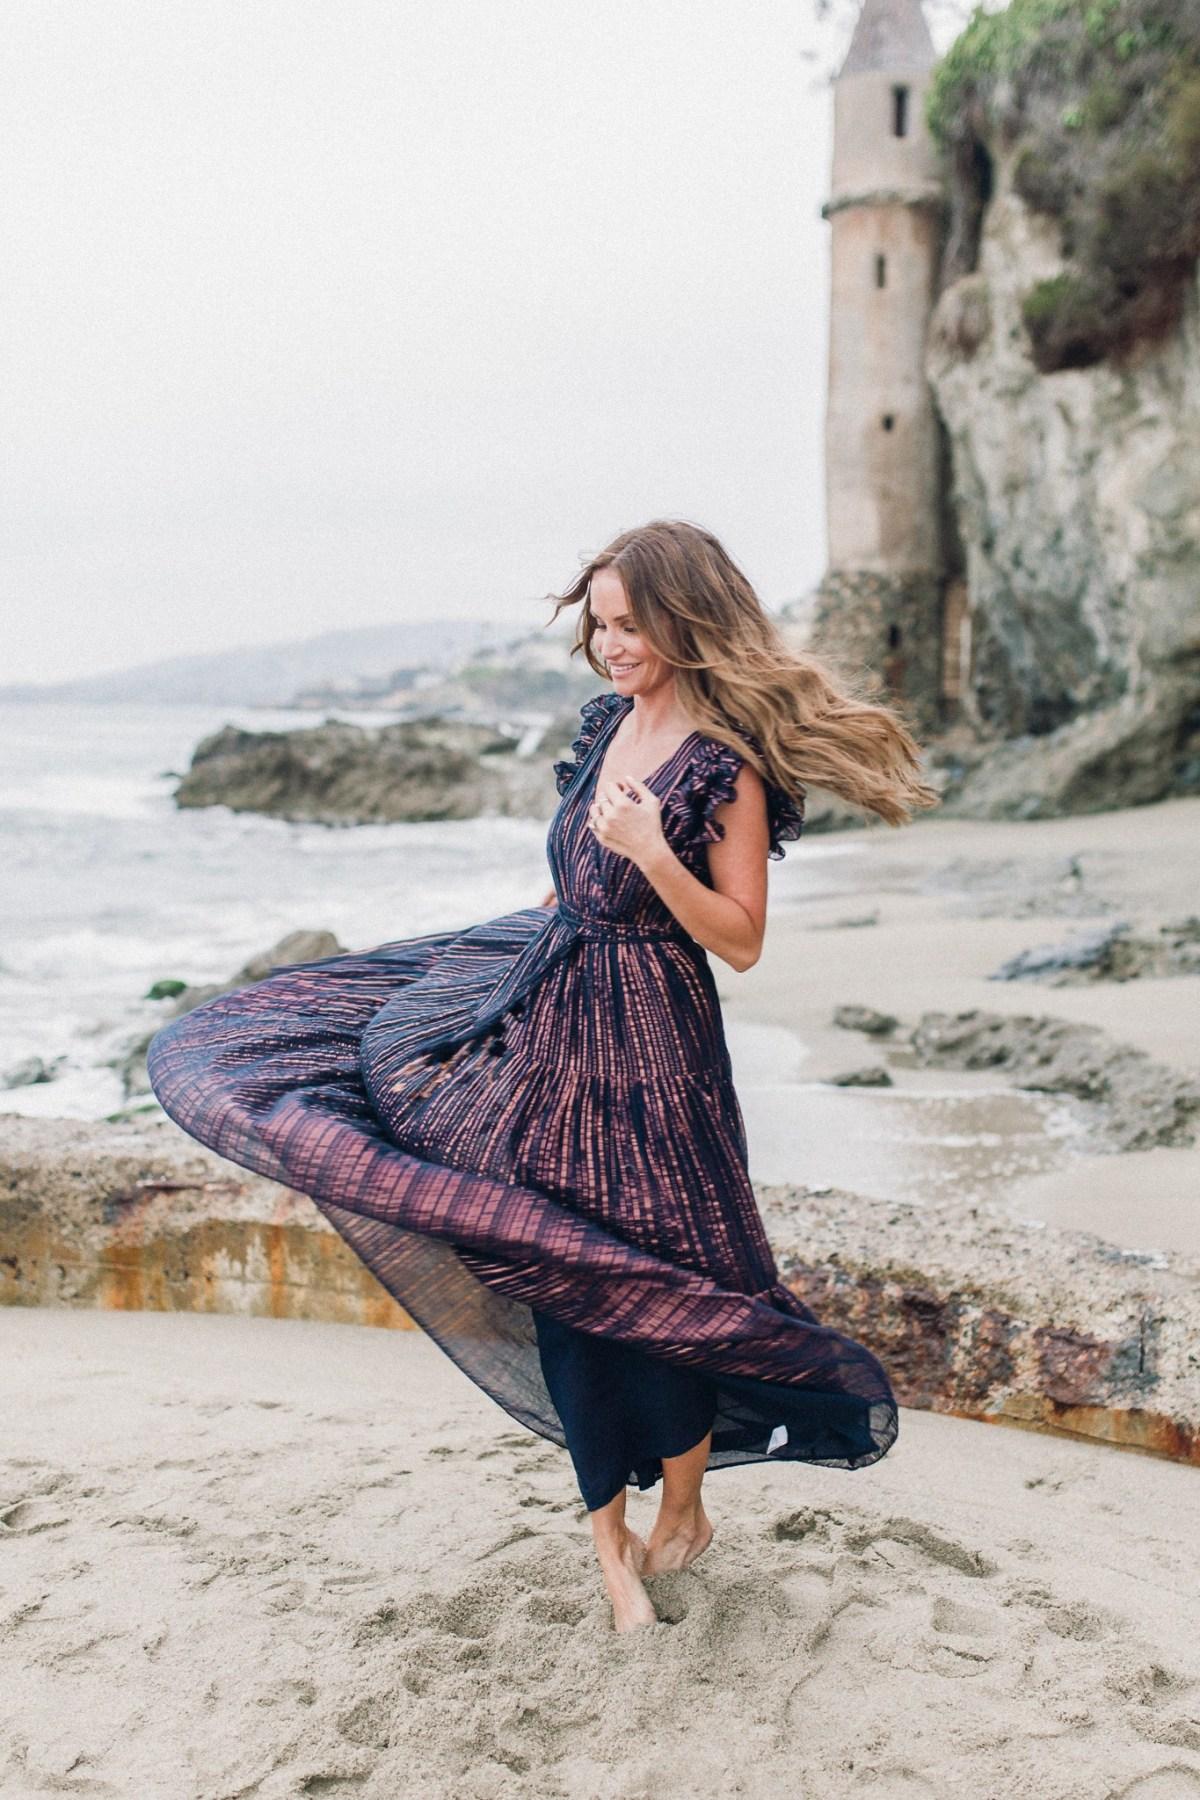 DKW Fashion Summer Dresses